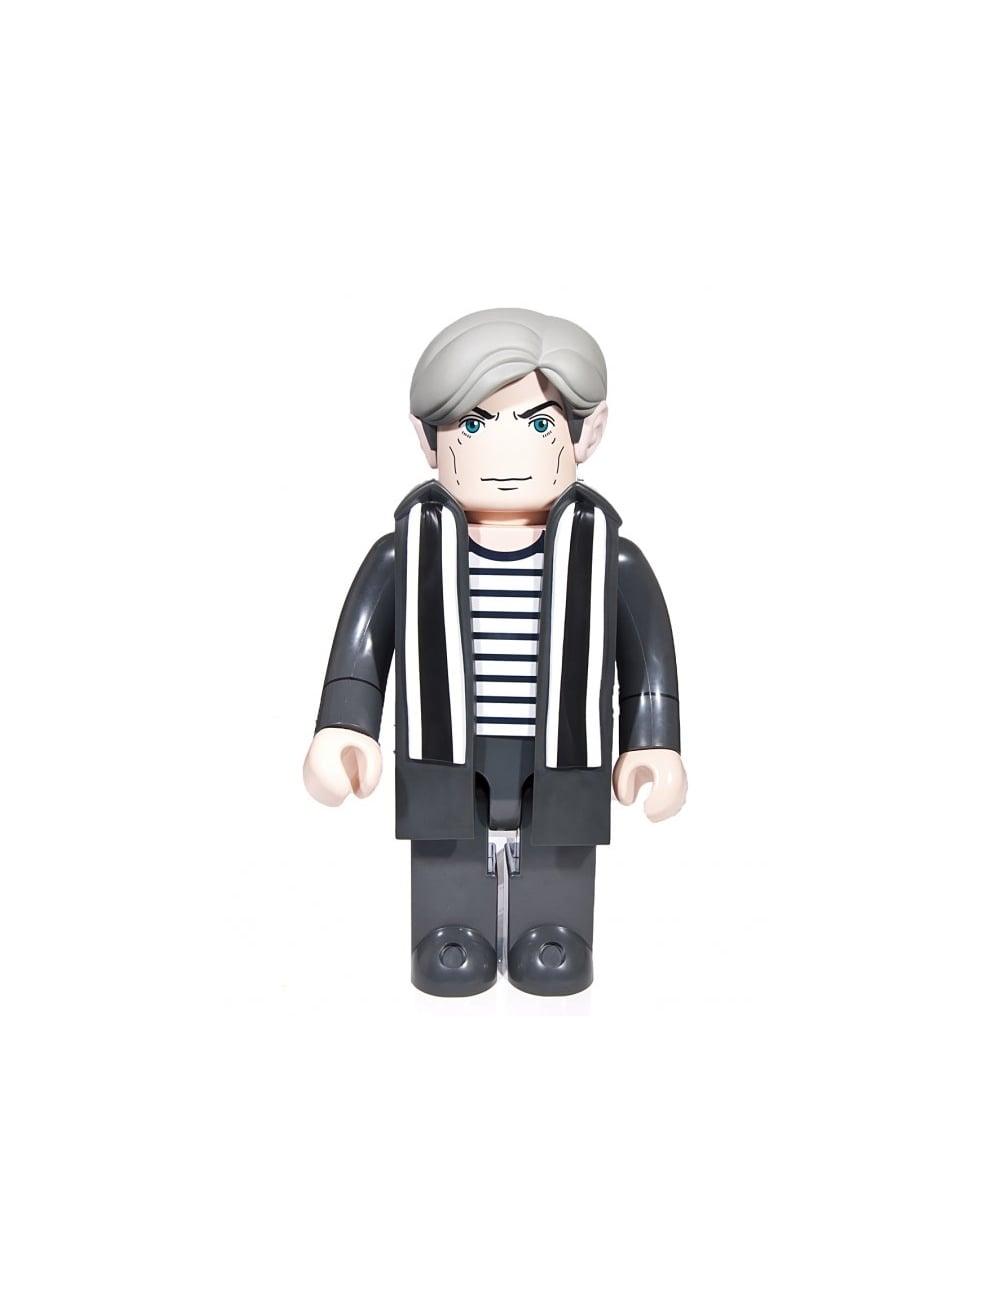 68dae3de Medicom Andy Warhol 1000% Kubrick - Lifestyle from Fat Buddha Store UK